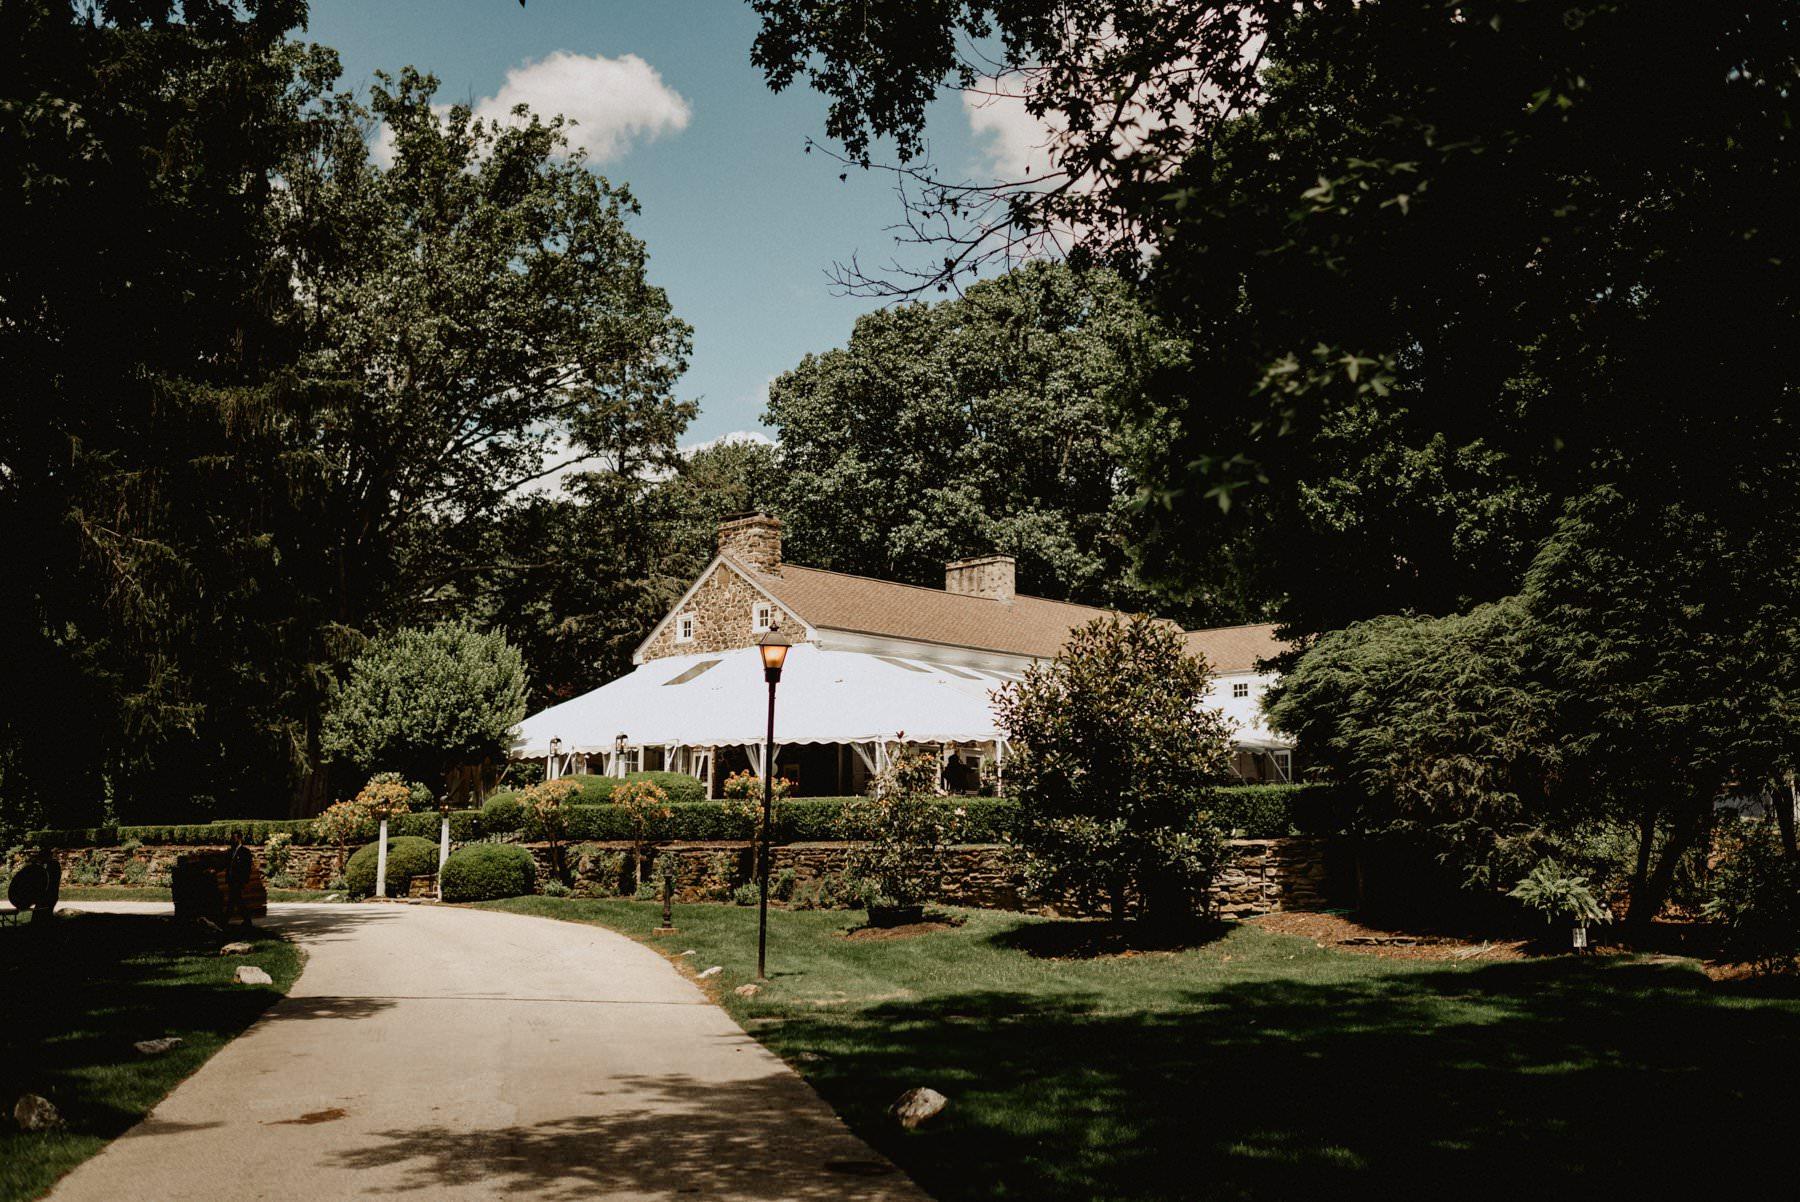 Appleford-estate-wedding-20.jpg